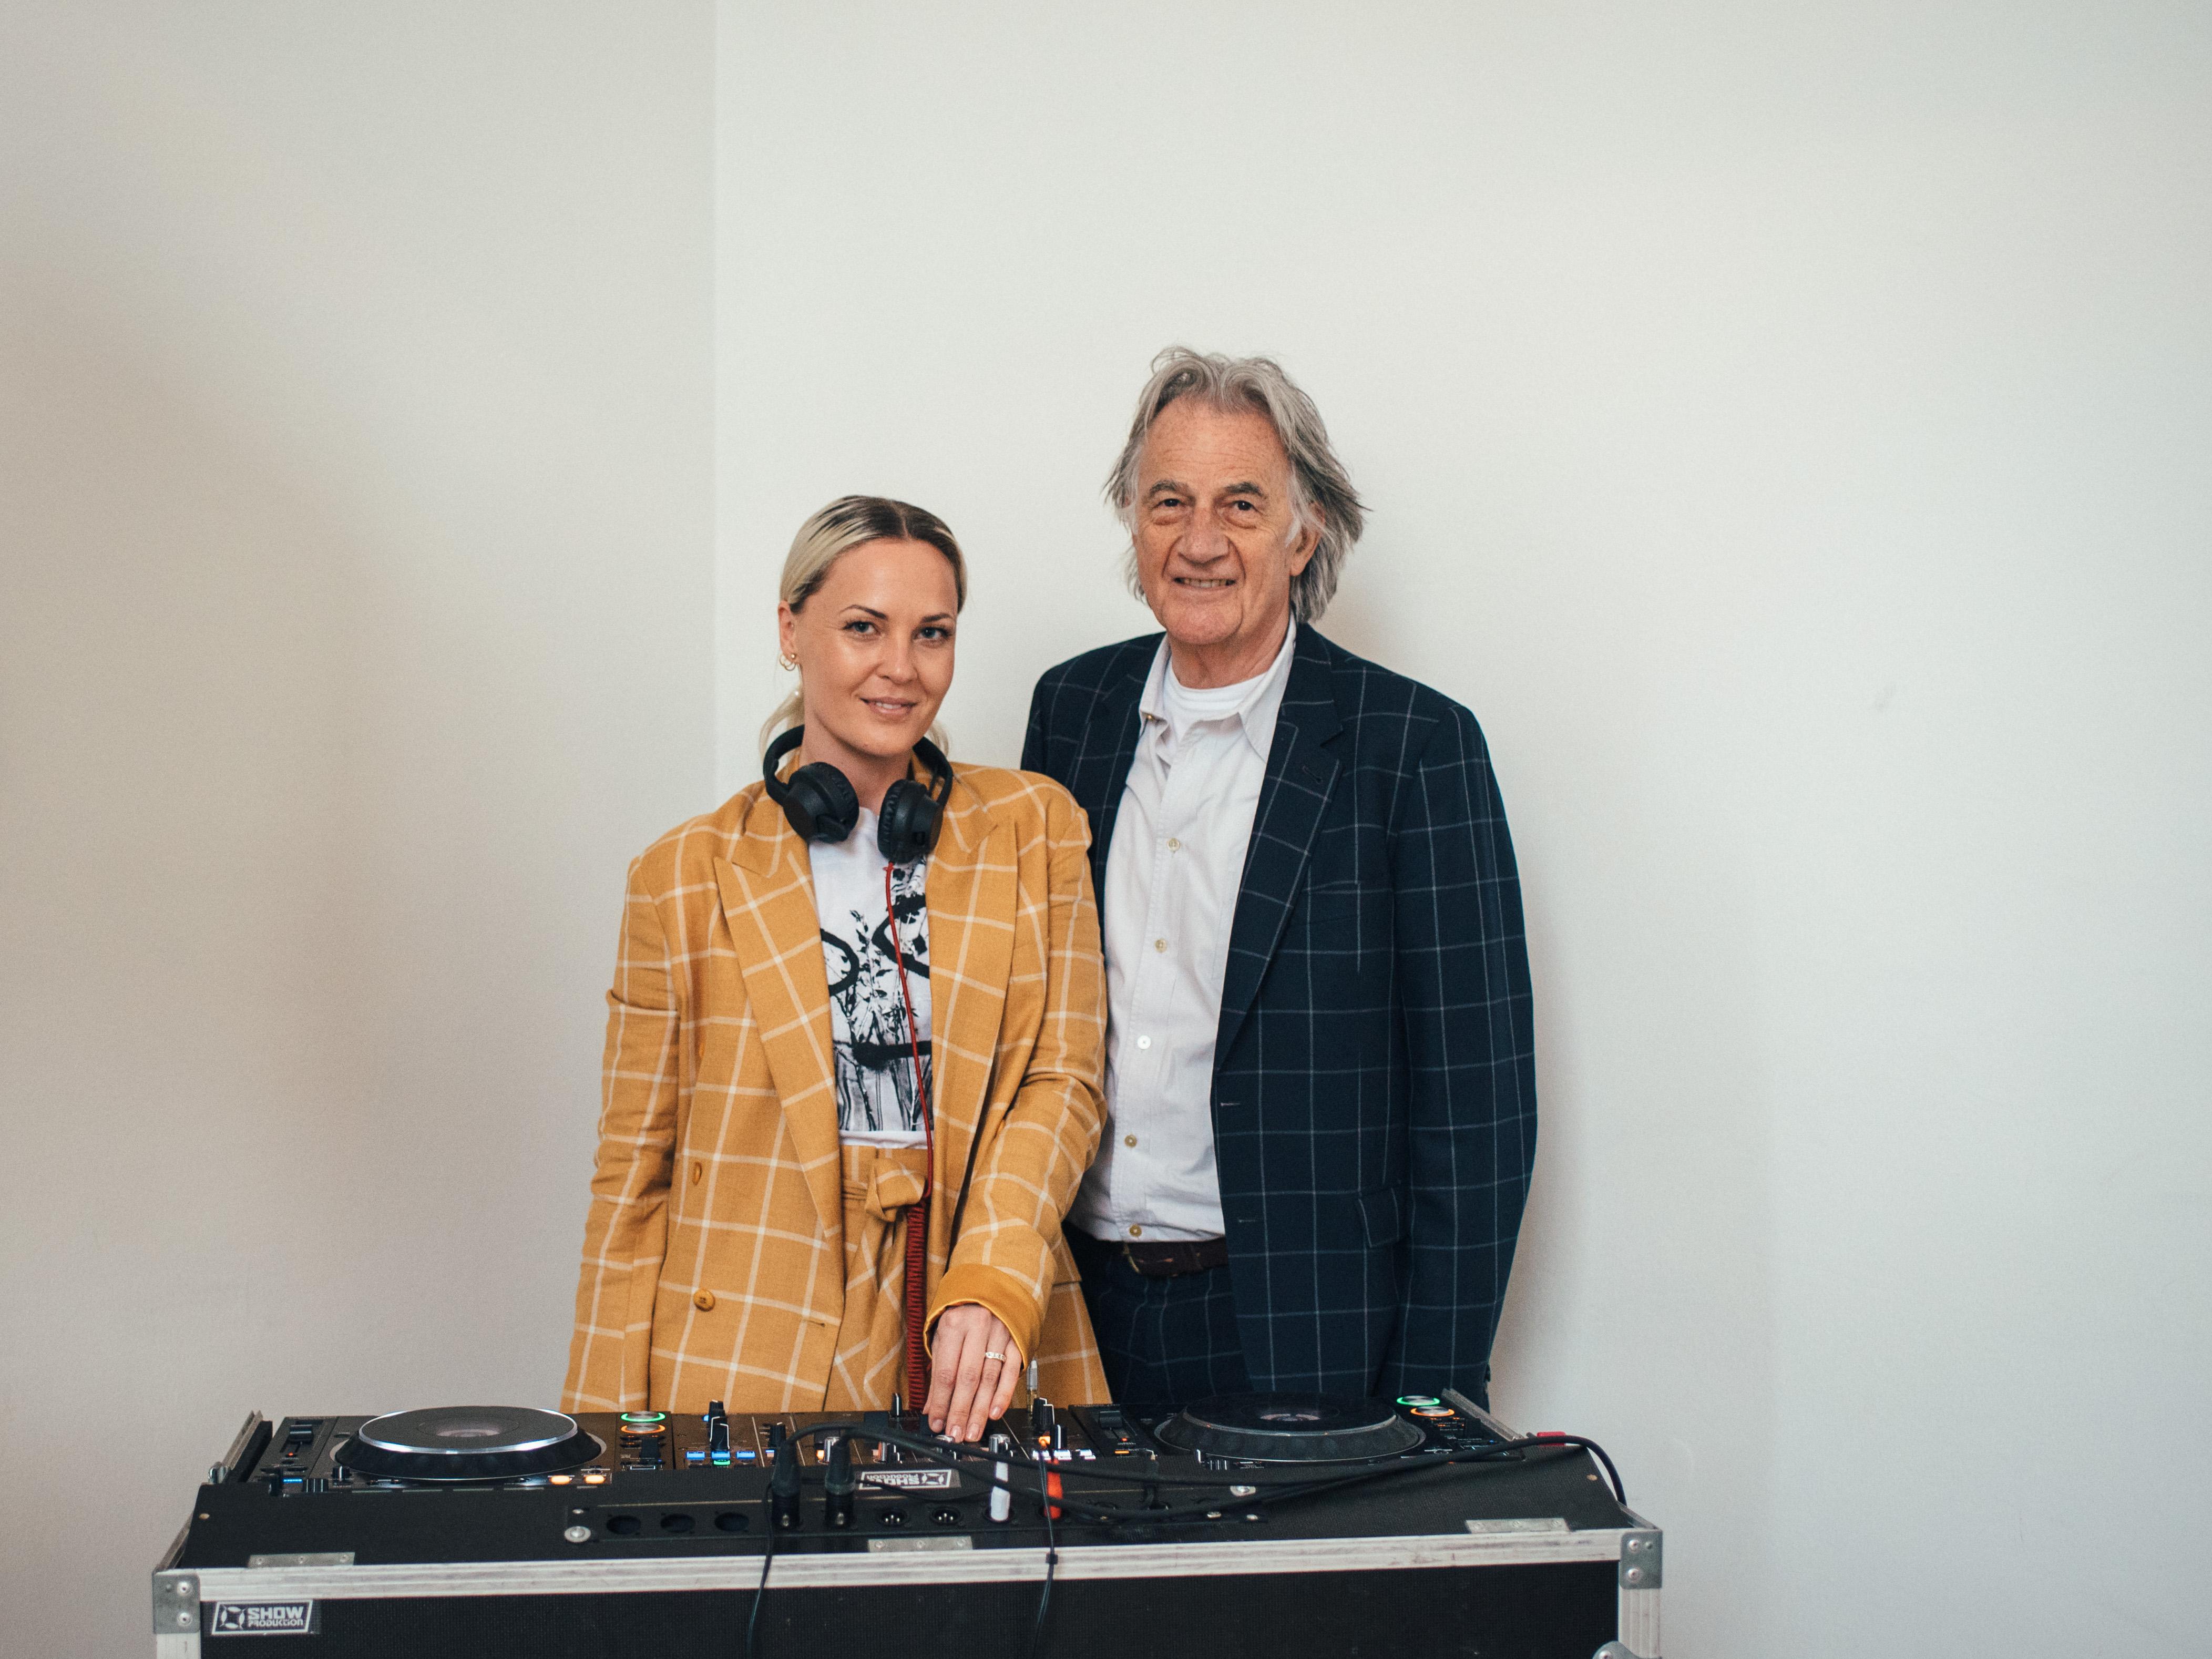 DJ, Fedty, Maria Barfod, Music